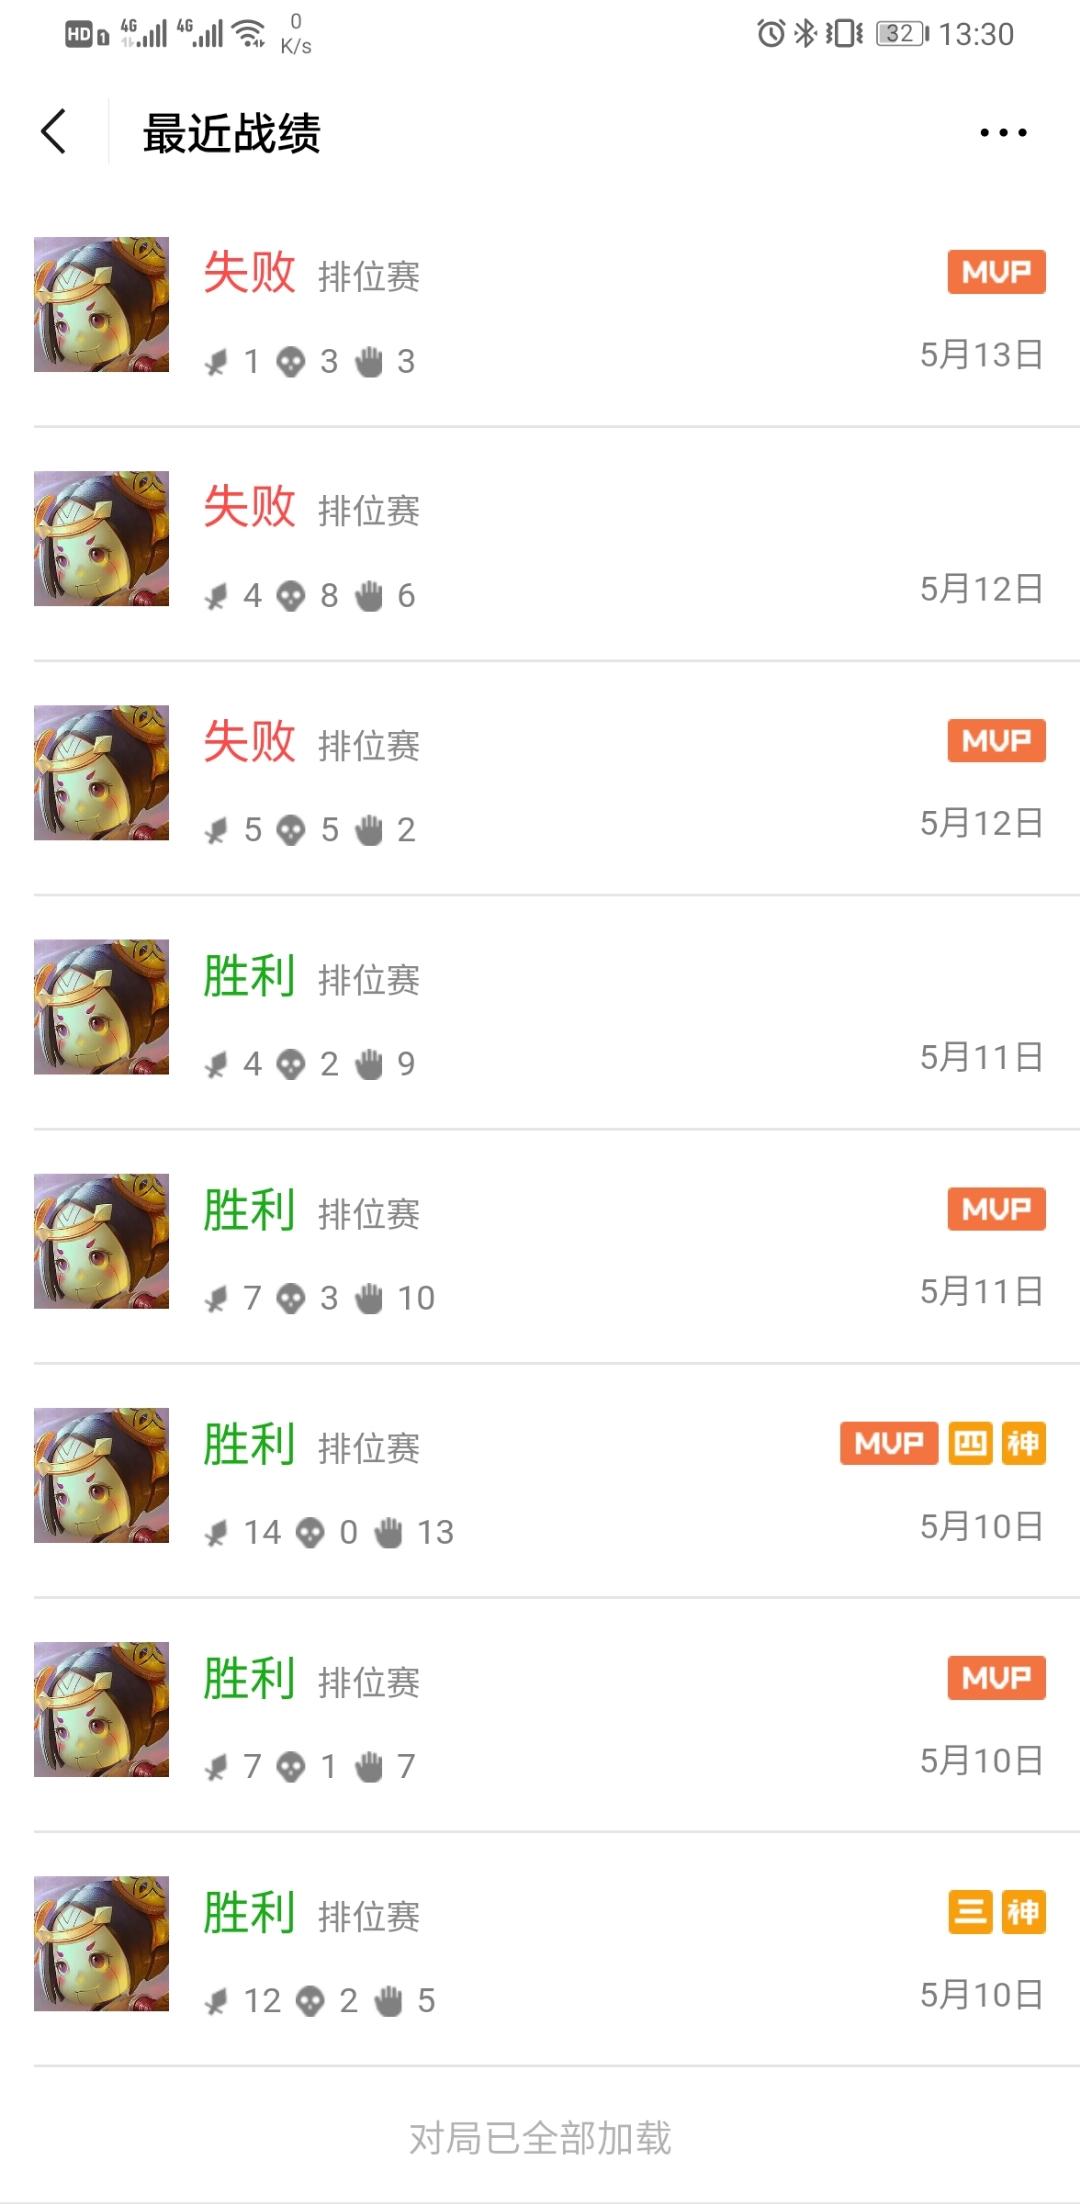 Screenshot_20200517_133017_com.tencent.mm.jpg